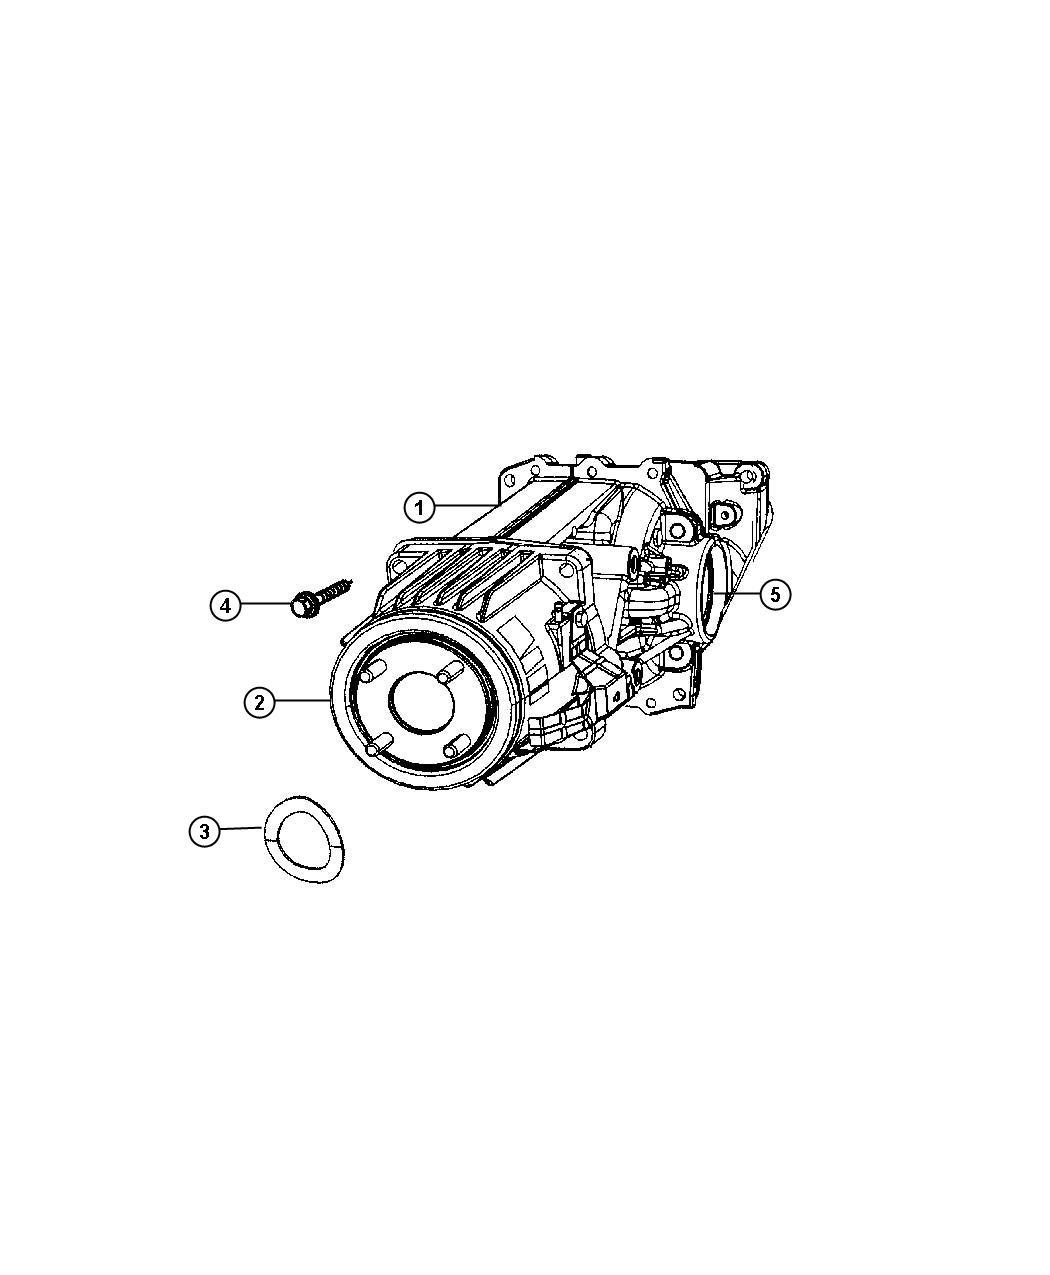 Dodge Caliber Seal. Input shaft, output shaft. Pinion gear